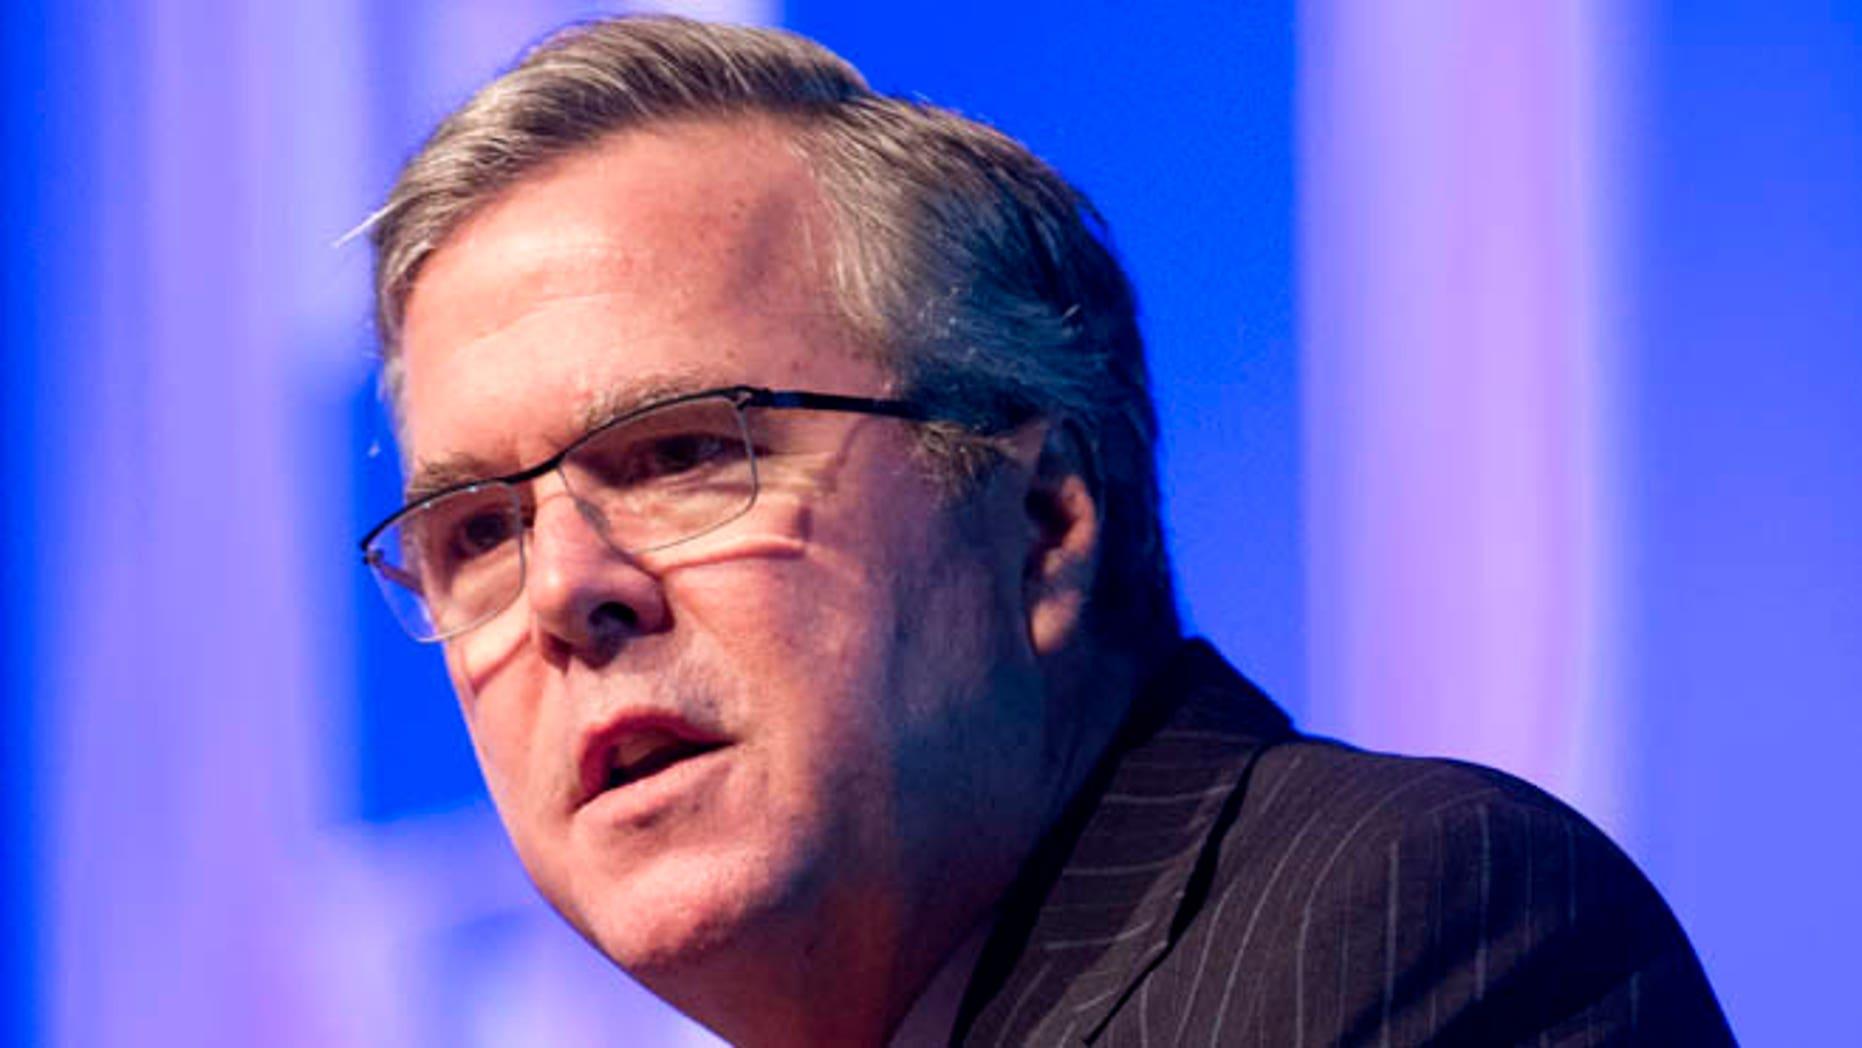 Jan. 29, 2014: Former Florida Gov. Jeb Bush speaks in Hollywood, Fla.